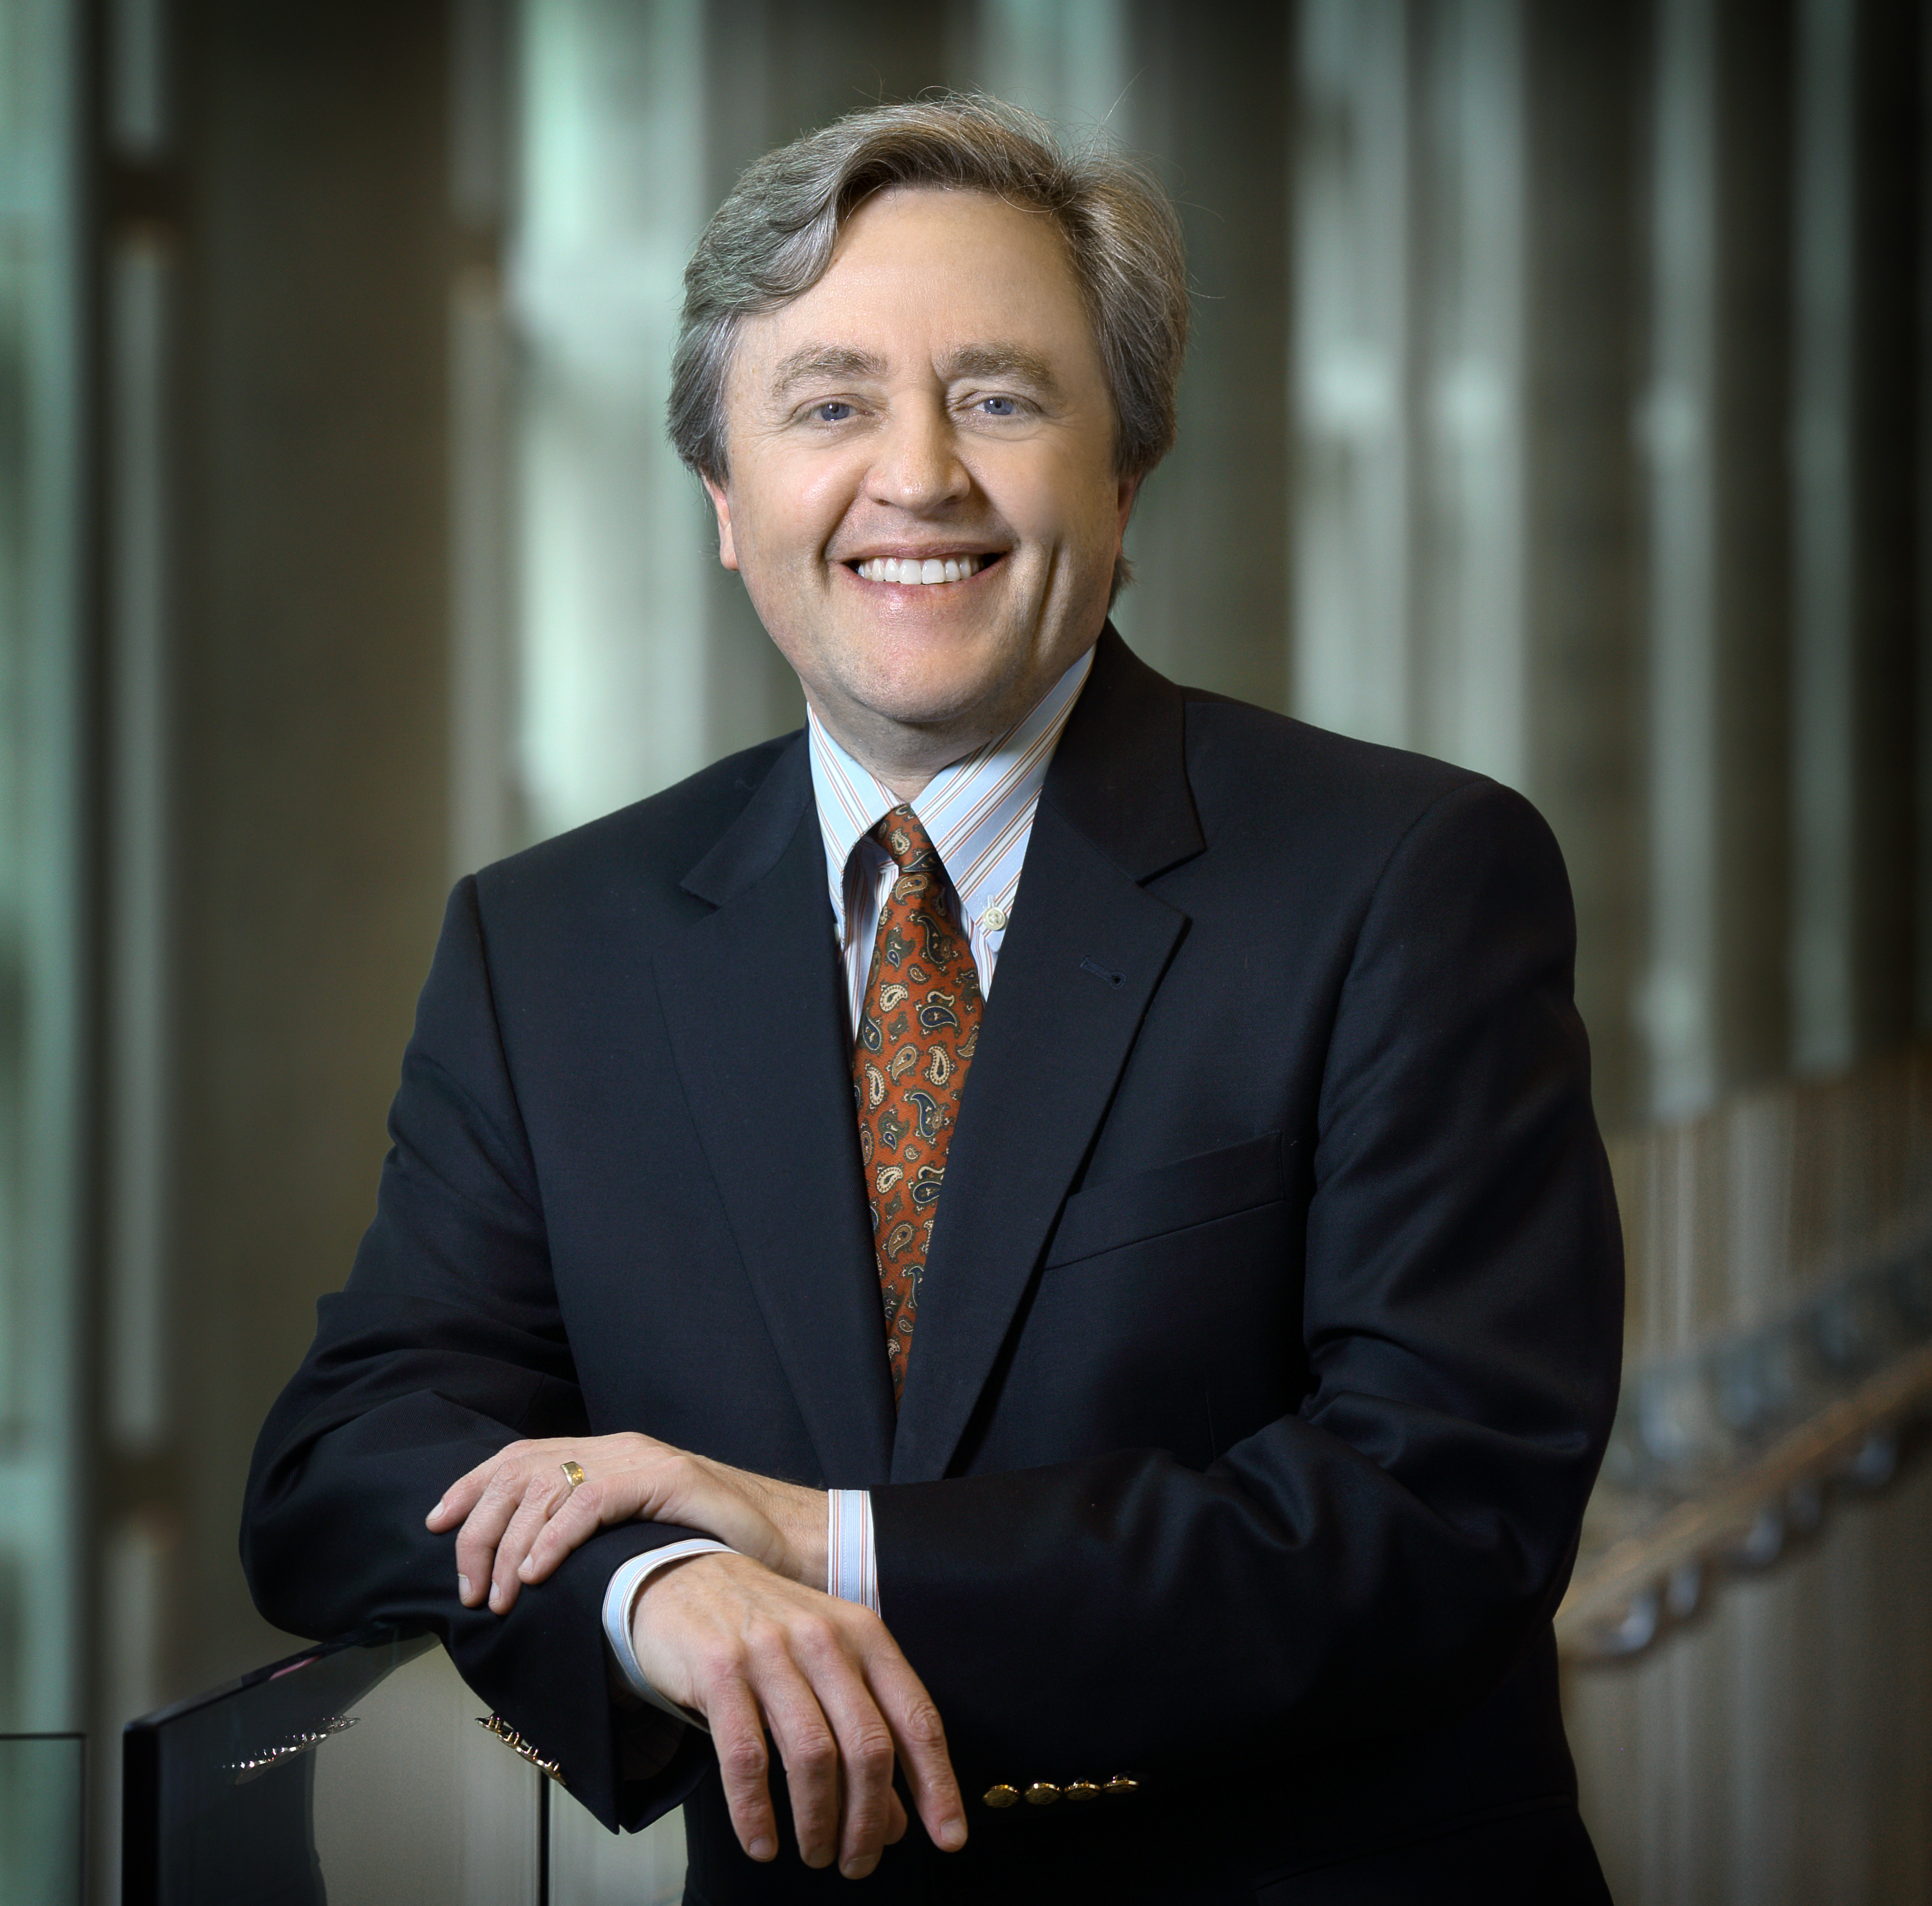 Headshot of Dr. Daniel Ford